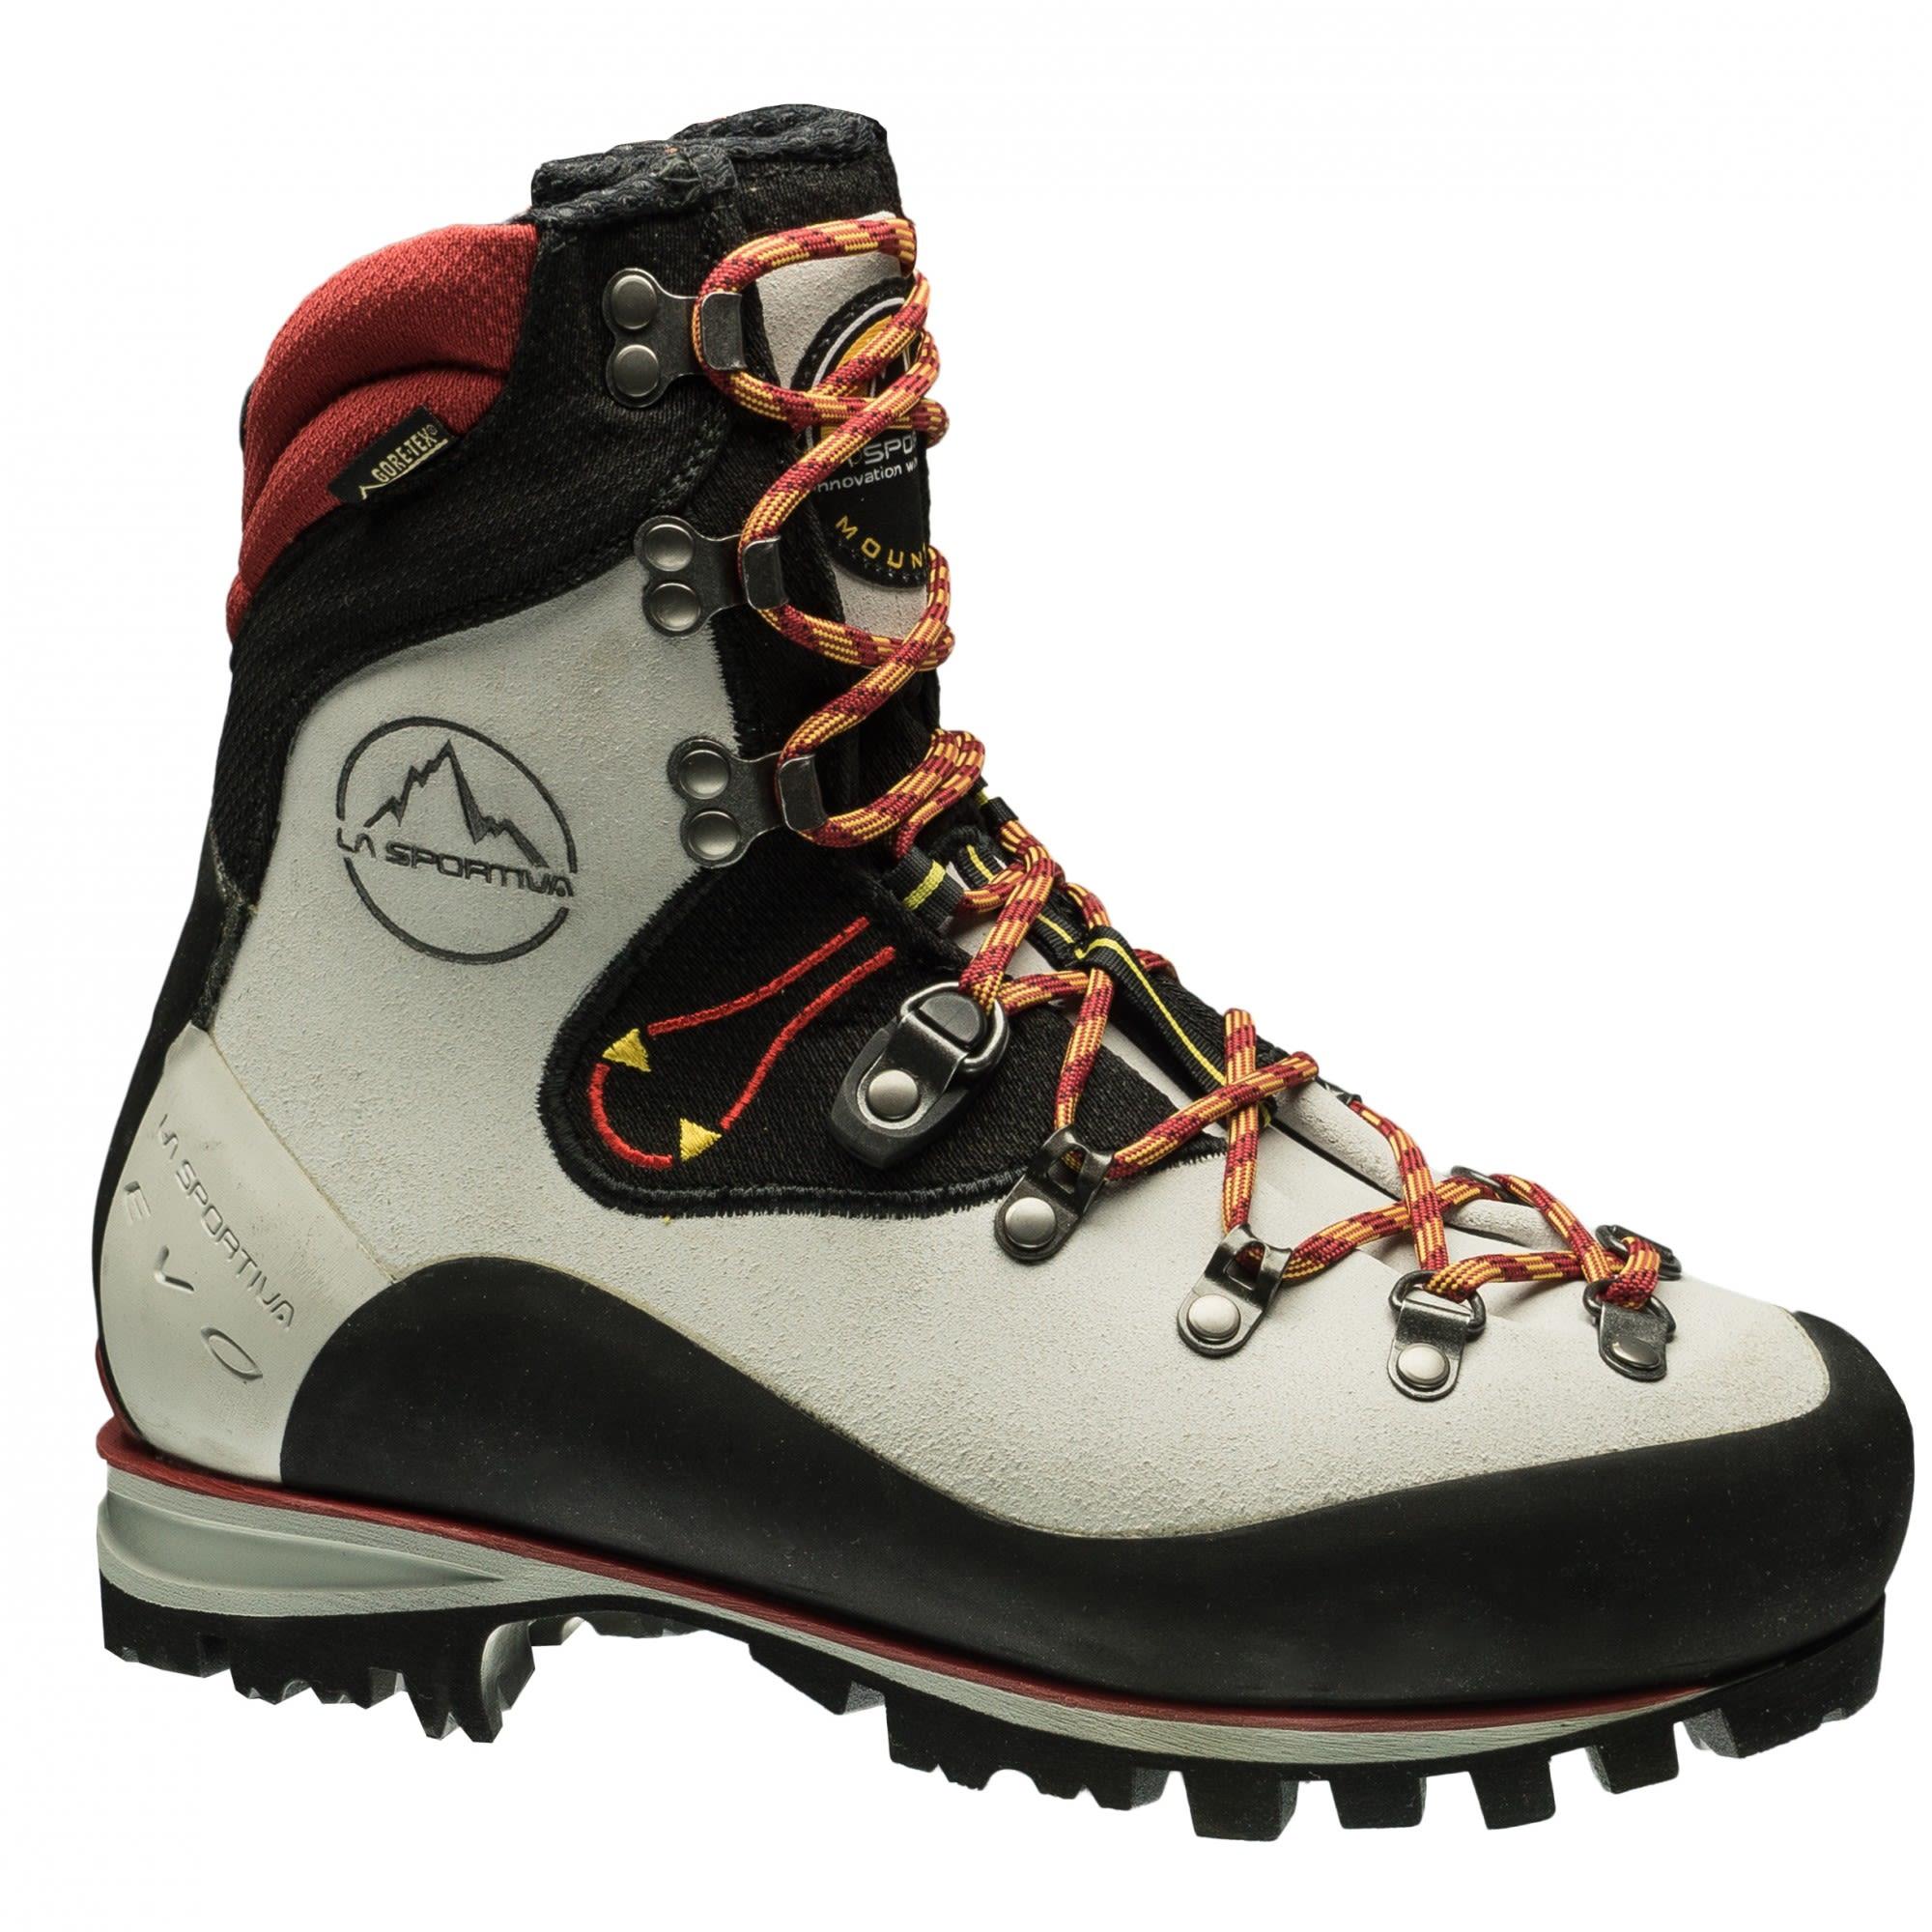 La Sportiva Nepal Trek Evo Gtx® Weiß, Female Gore-Tex® Wanderschuh, 40.5